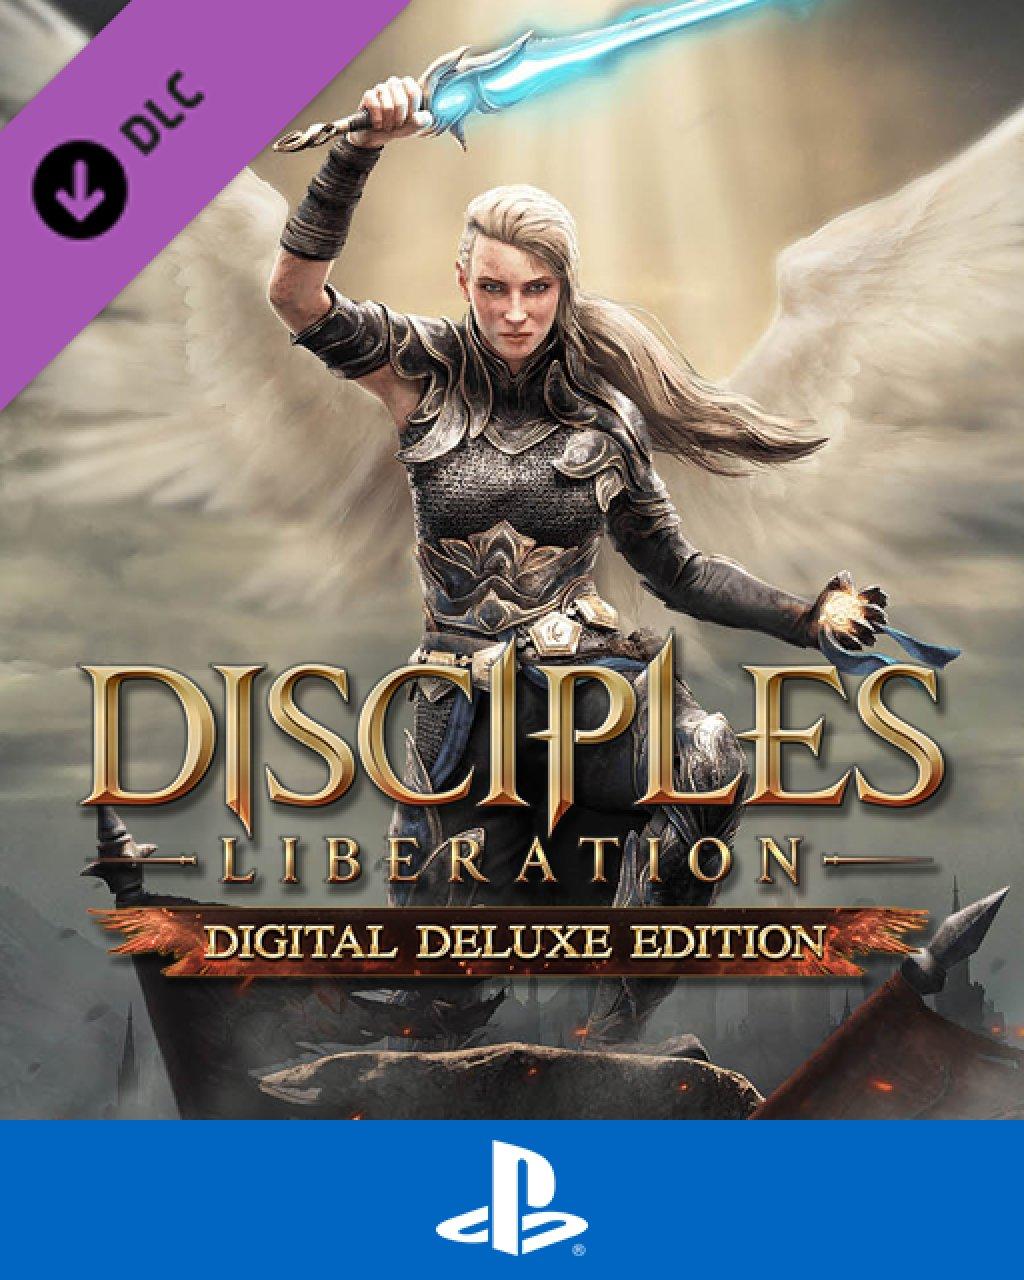 Disciples Liberation Digital Deluxe Edition Content